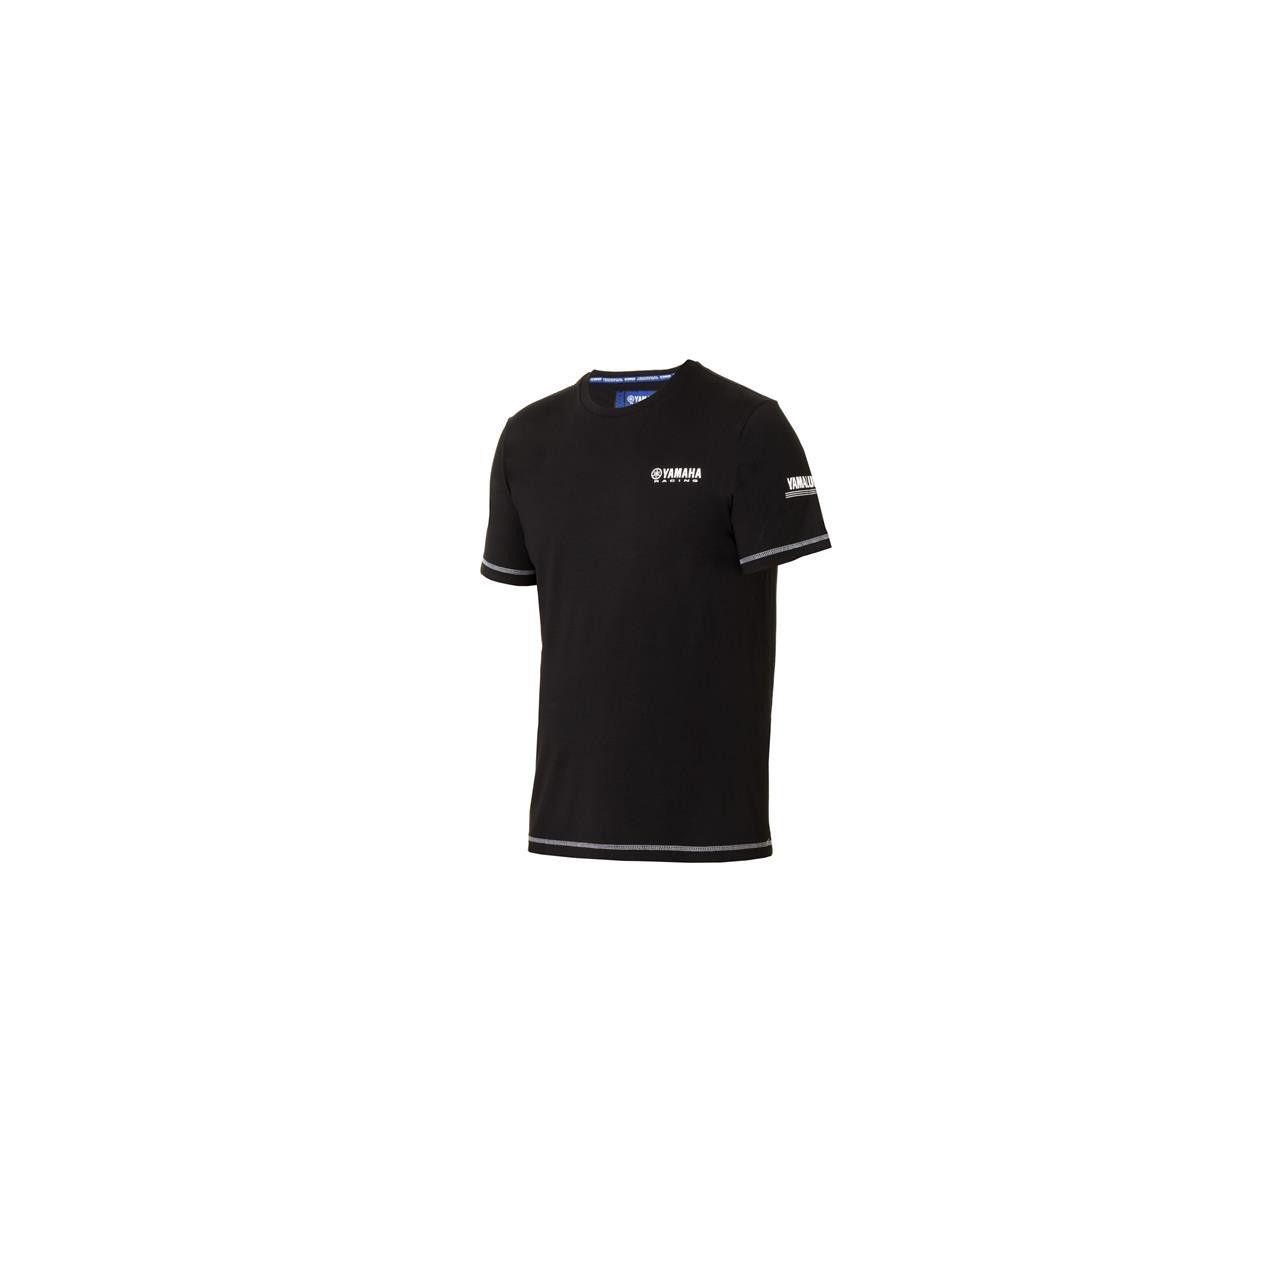 YAMAHA T-shirt Casual homme Paddock 2018